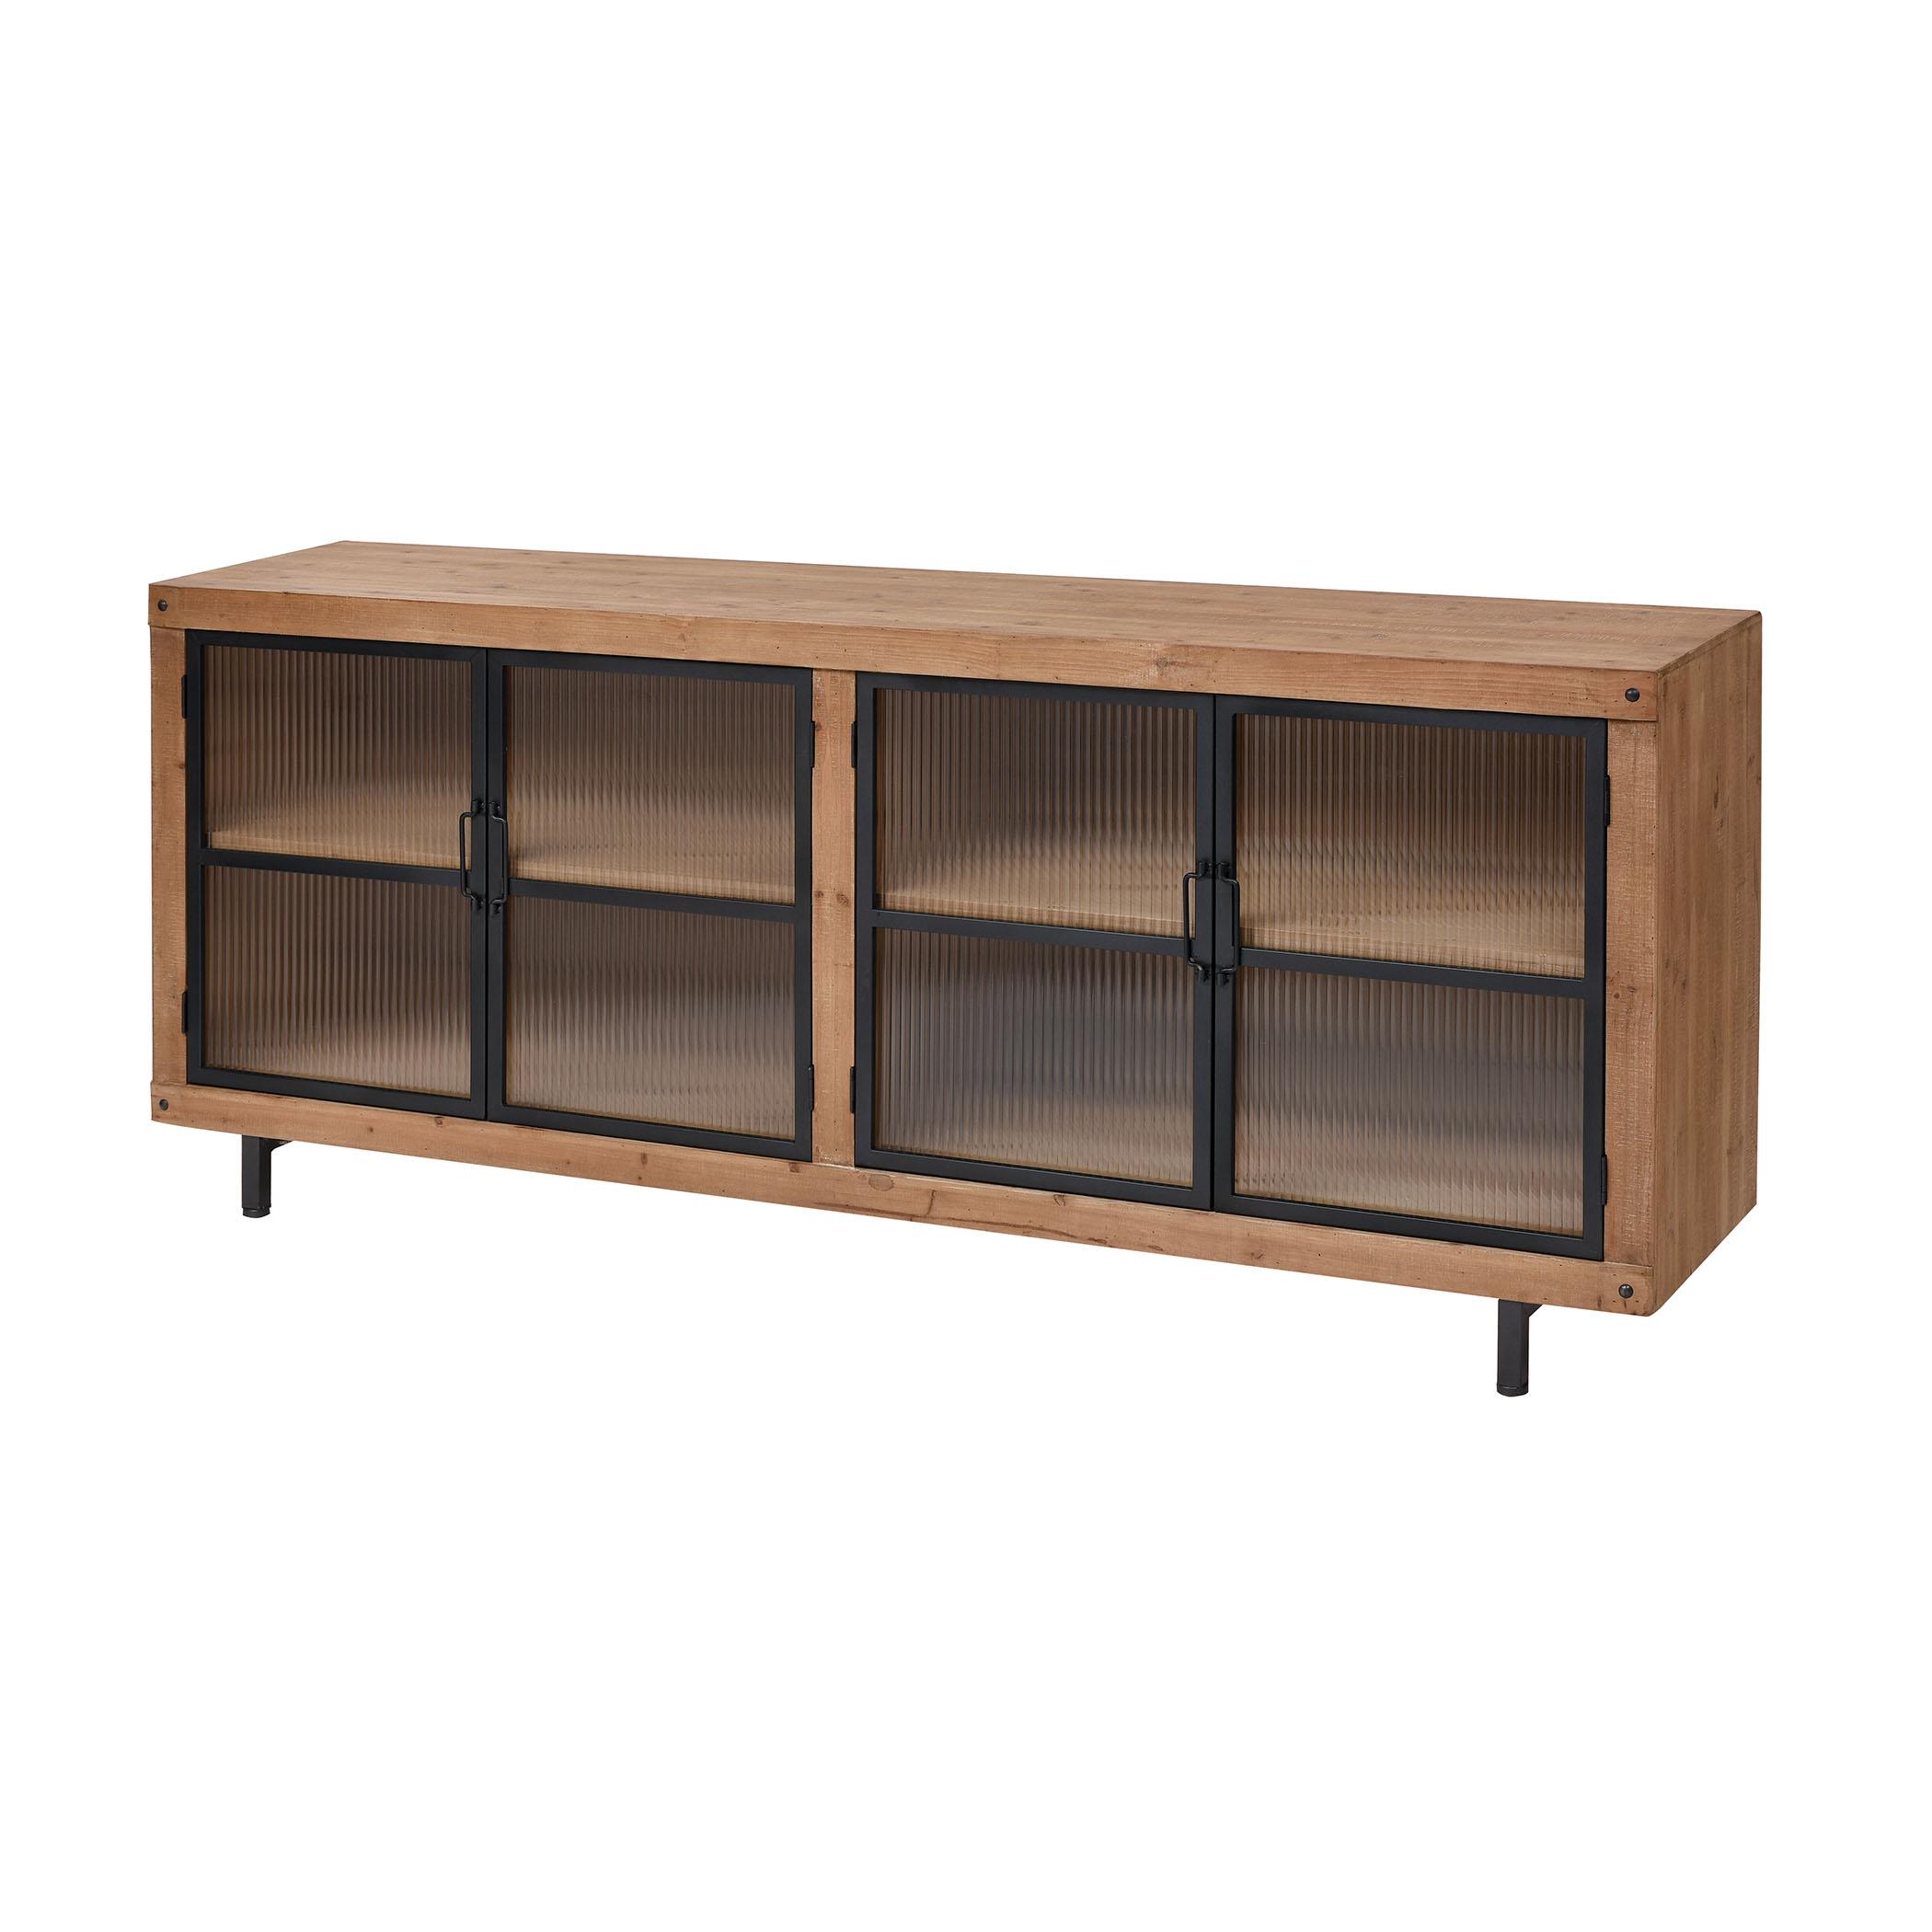 Institution Media Unit in Natural Wood Tone And Black 3187-020 | ELK Home